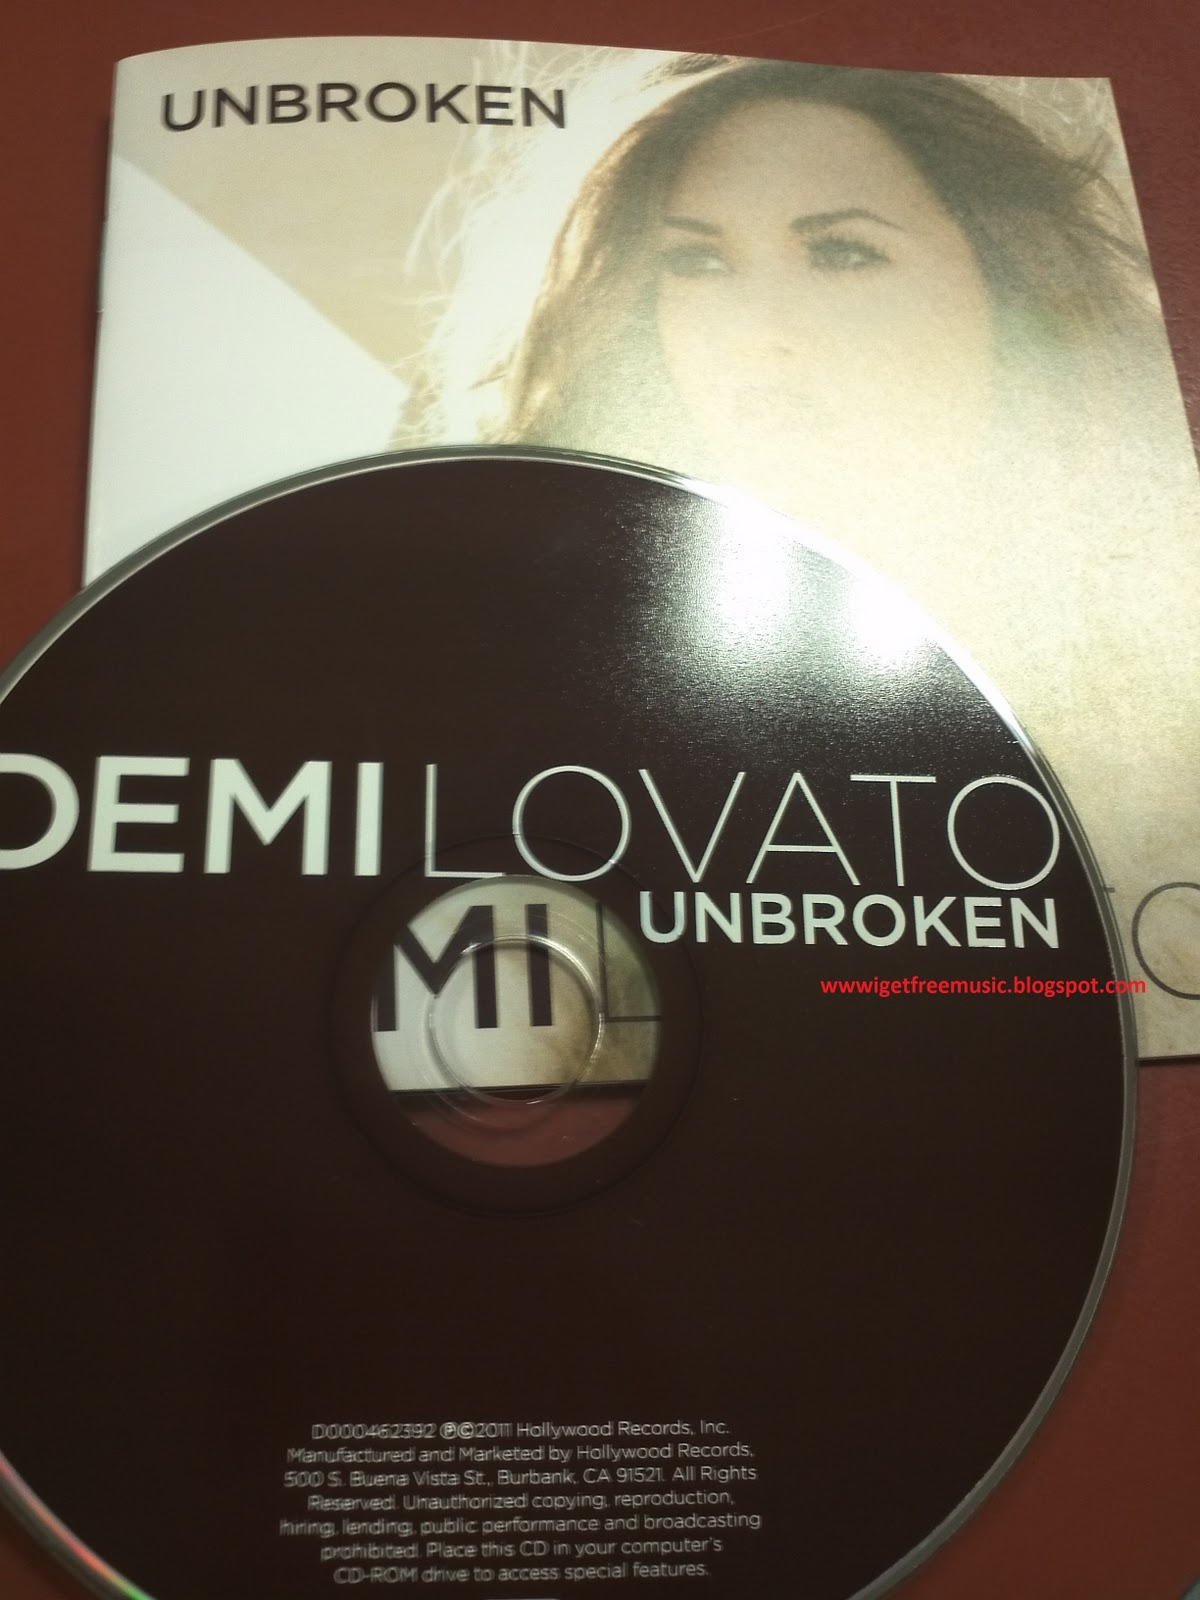 Demi Lovato Titel